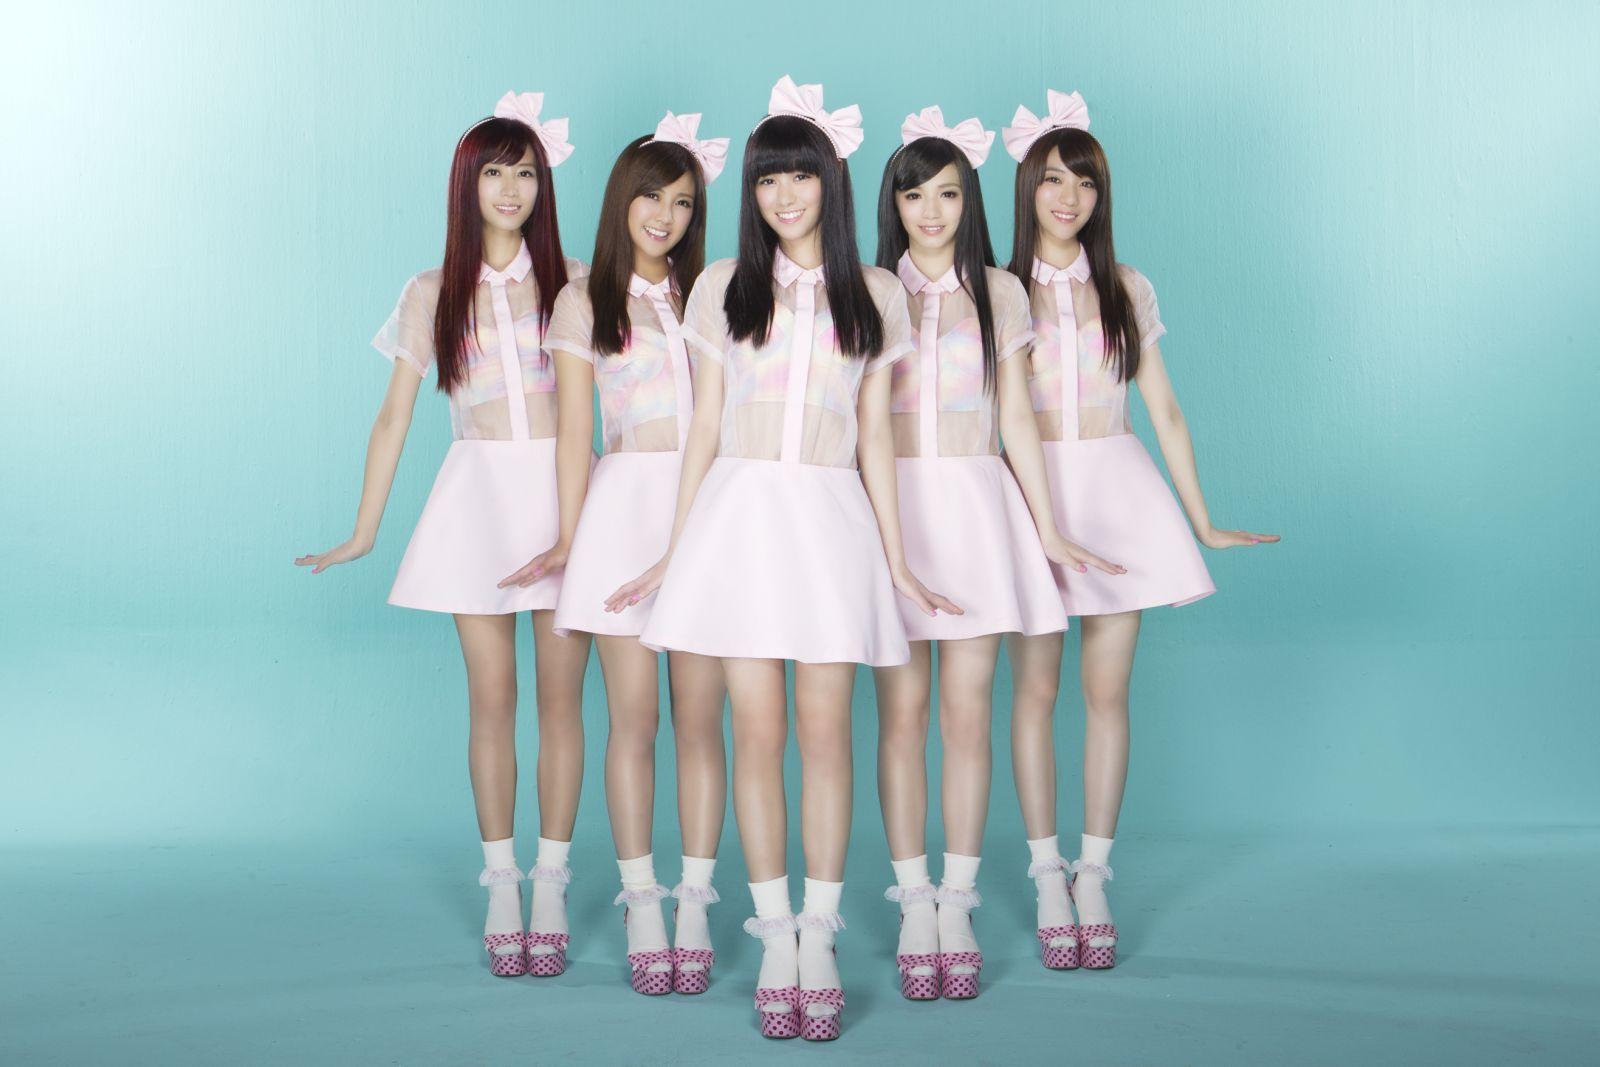 PlayMusic音乐网 华研5正妹Popu Lady出击 写真 EP抢攻宝岛美少女版图